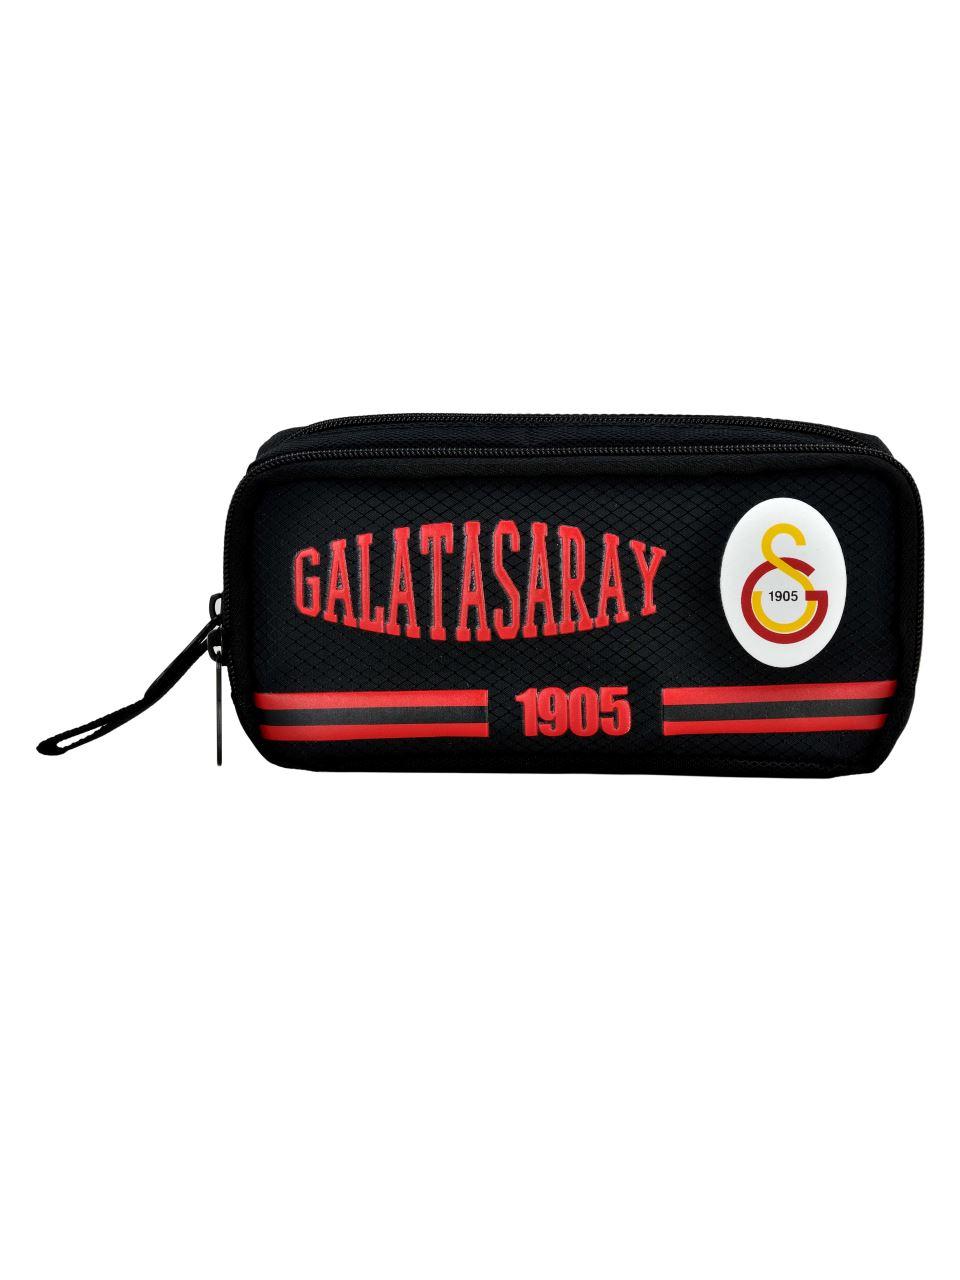 U13000 Galatasaray Kalem Çantası 88595